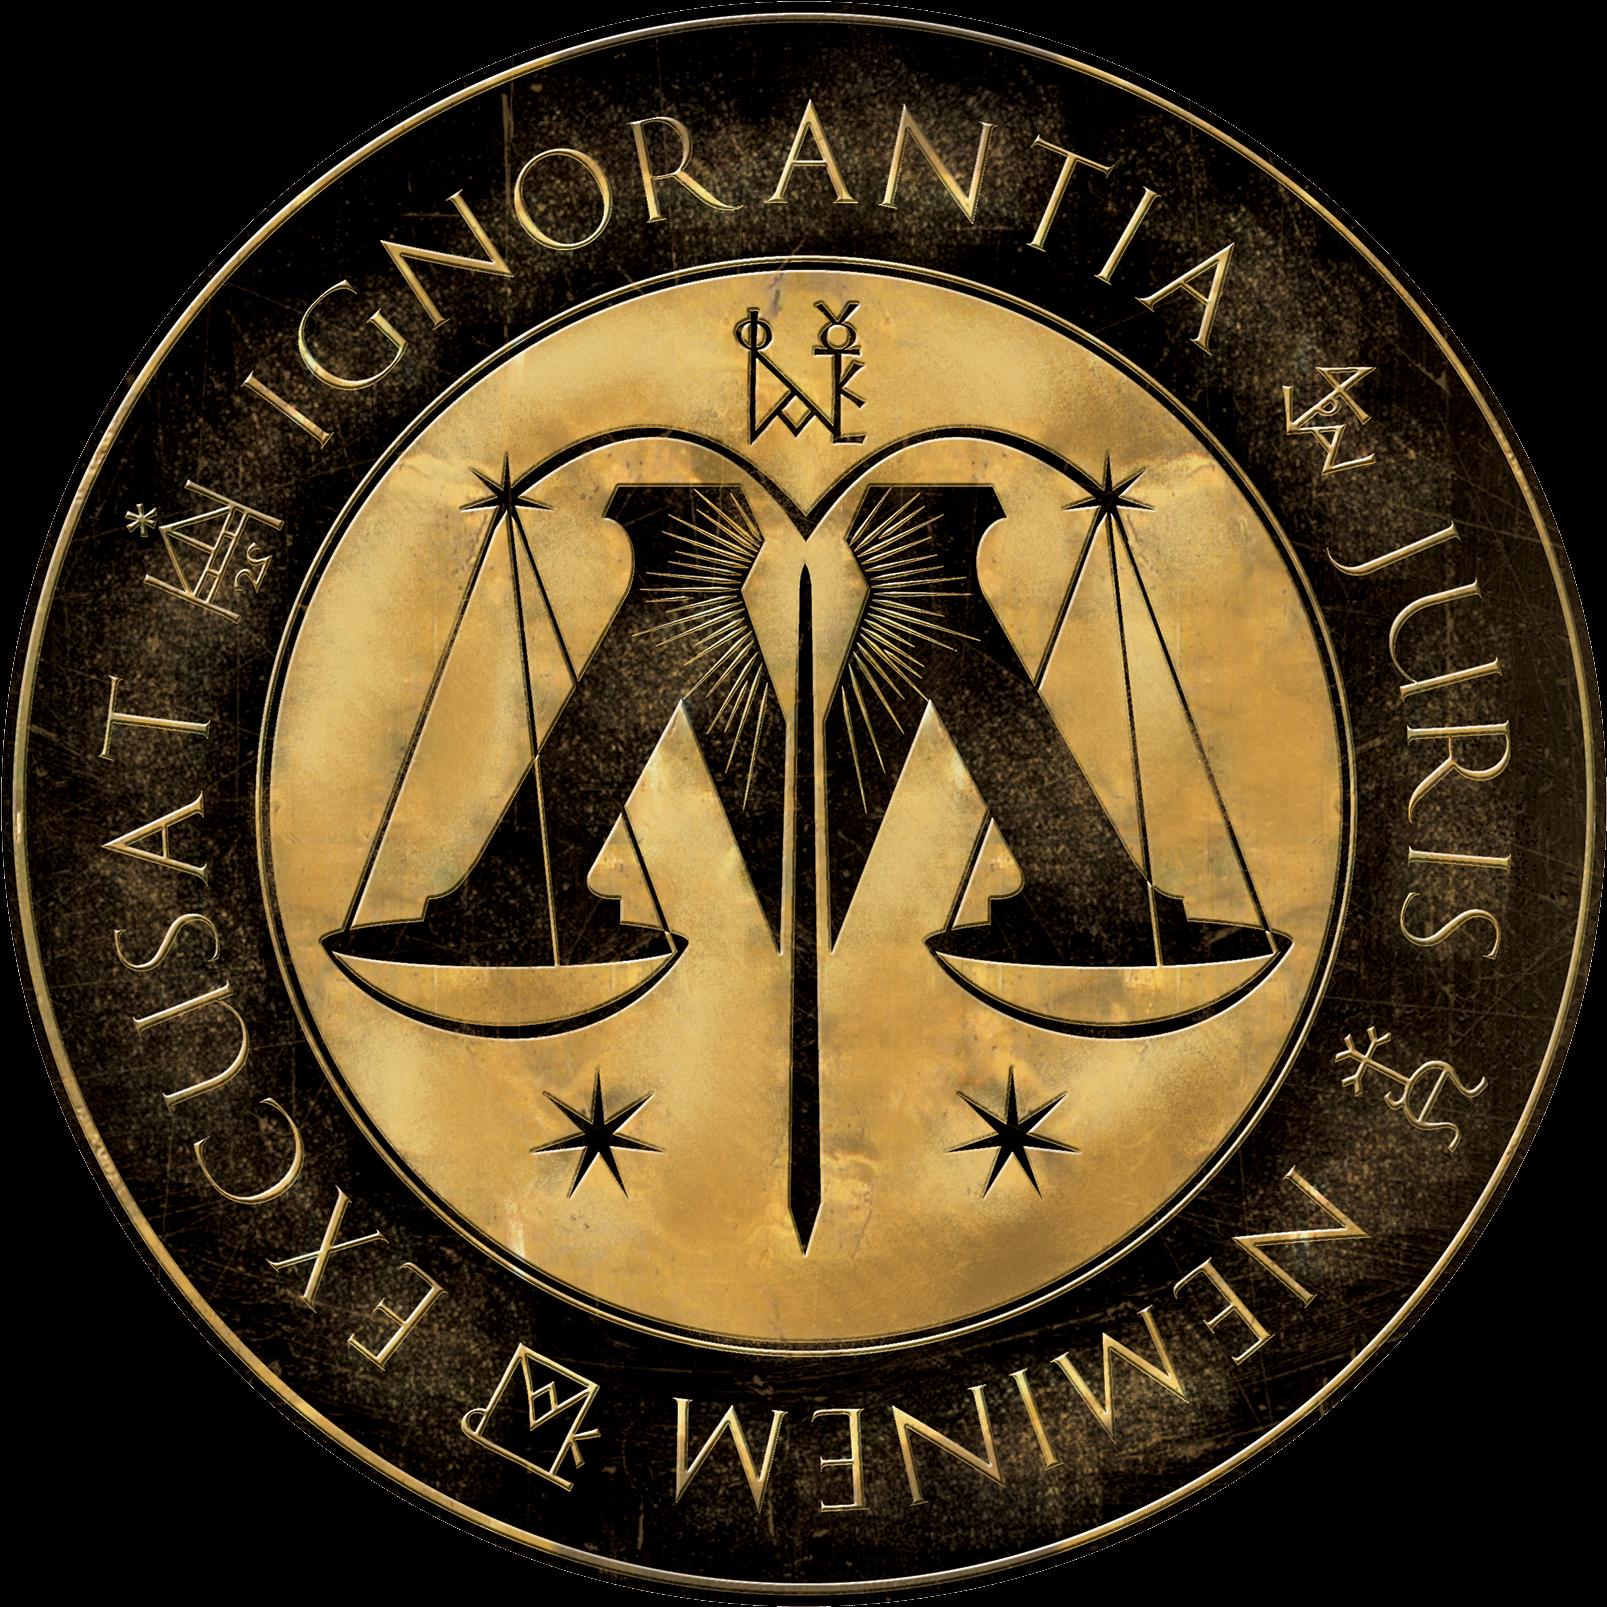 03 Min Logo Degd - Harry Potter Ministry Of Magic Logo (480x479), Png Download